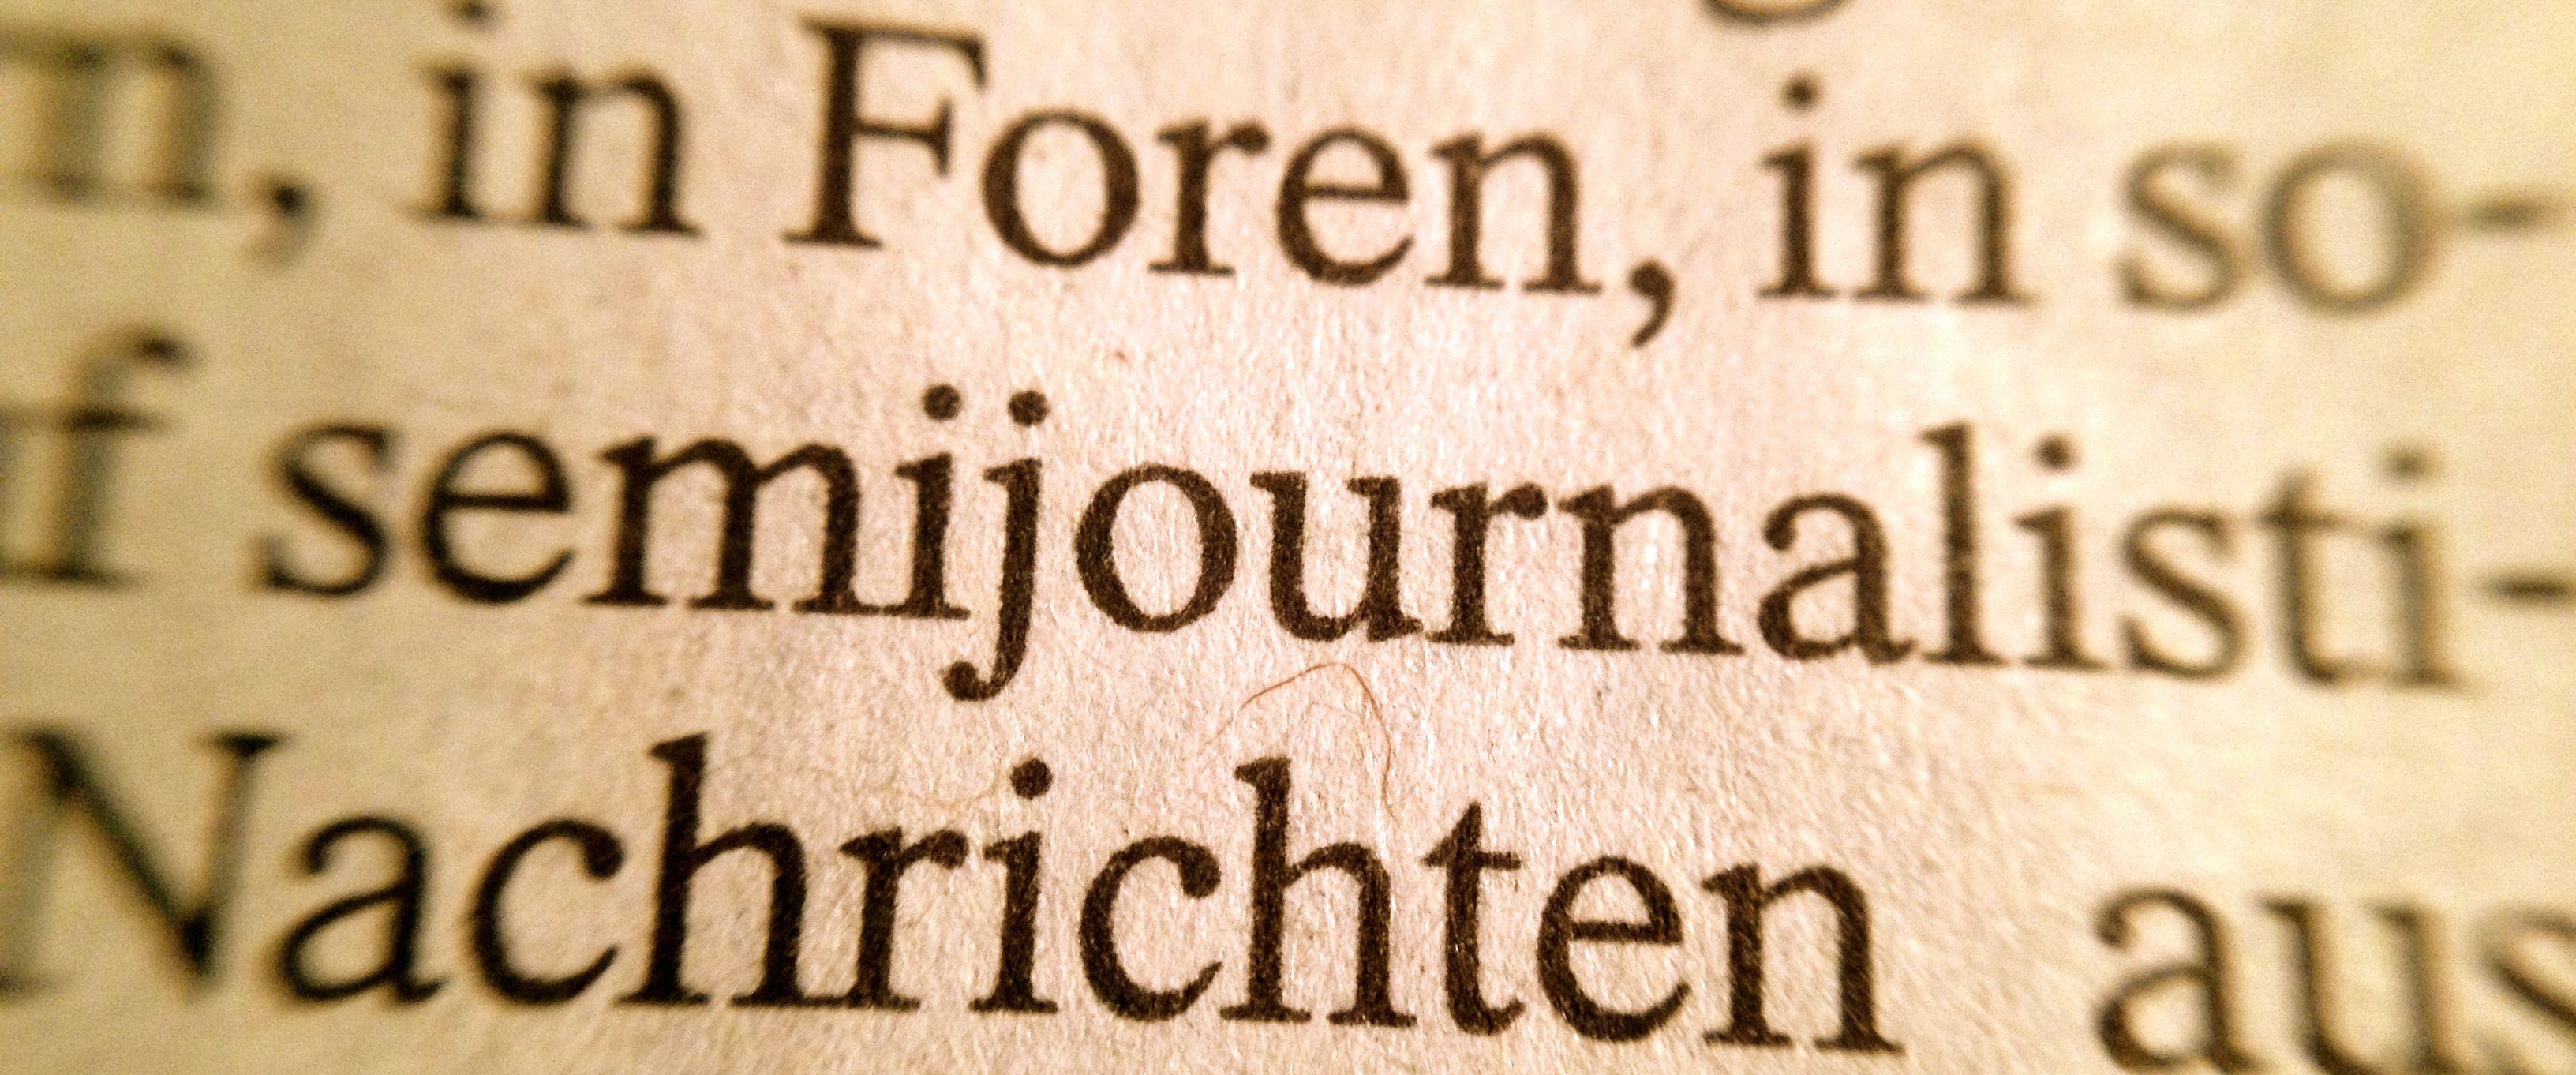 semijournalistisch